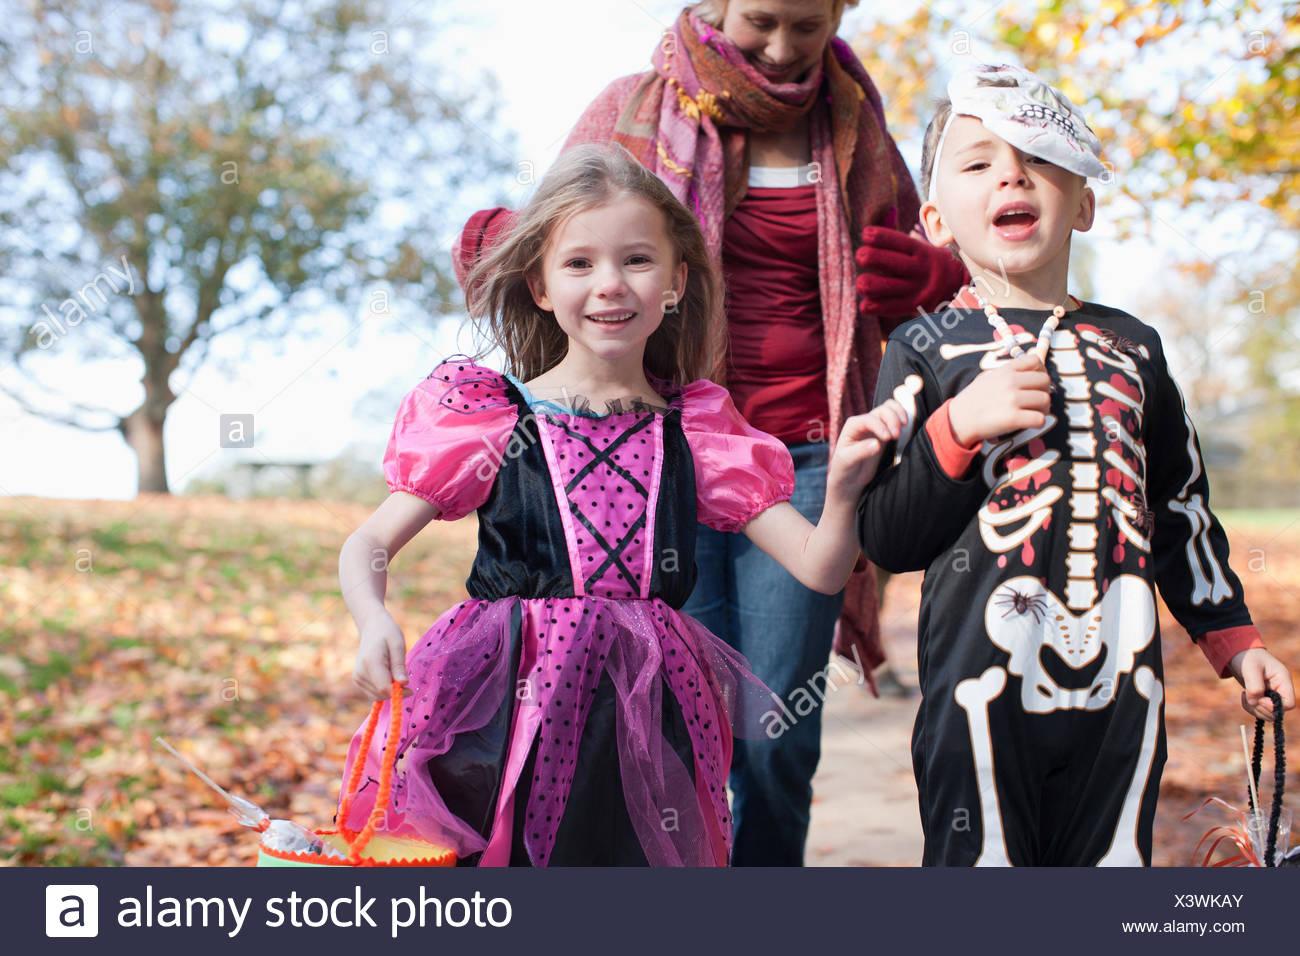 Großmutter mit Enkel in Halloween-Kostümen Stockbild